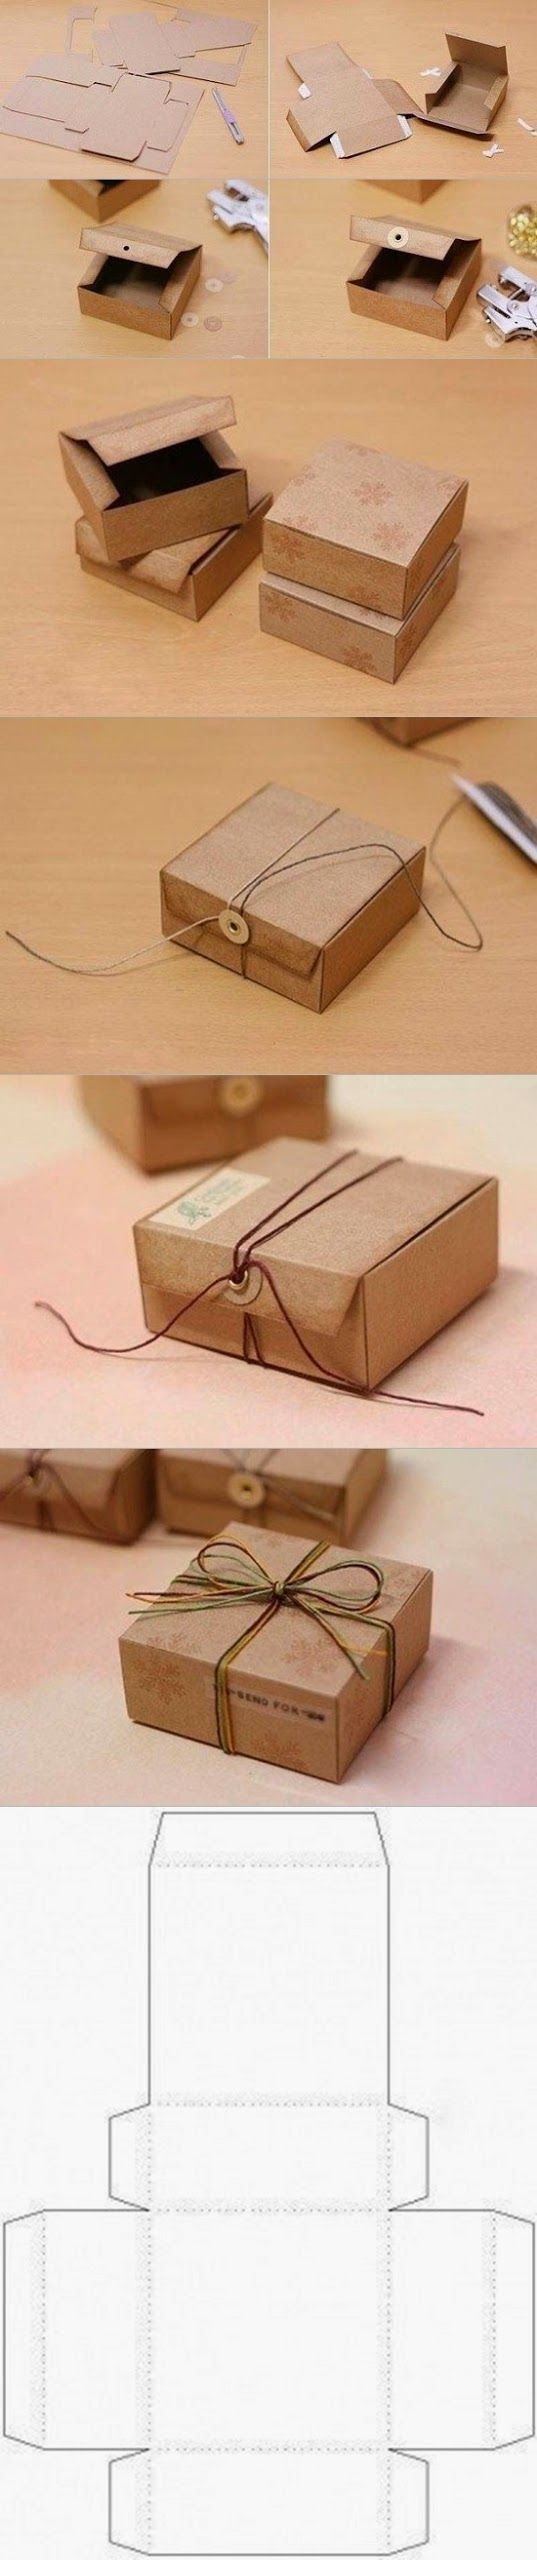 & 10 ideas para envolver tus regalos | Box Gift and Craft Aboutintivar.Com